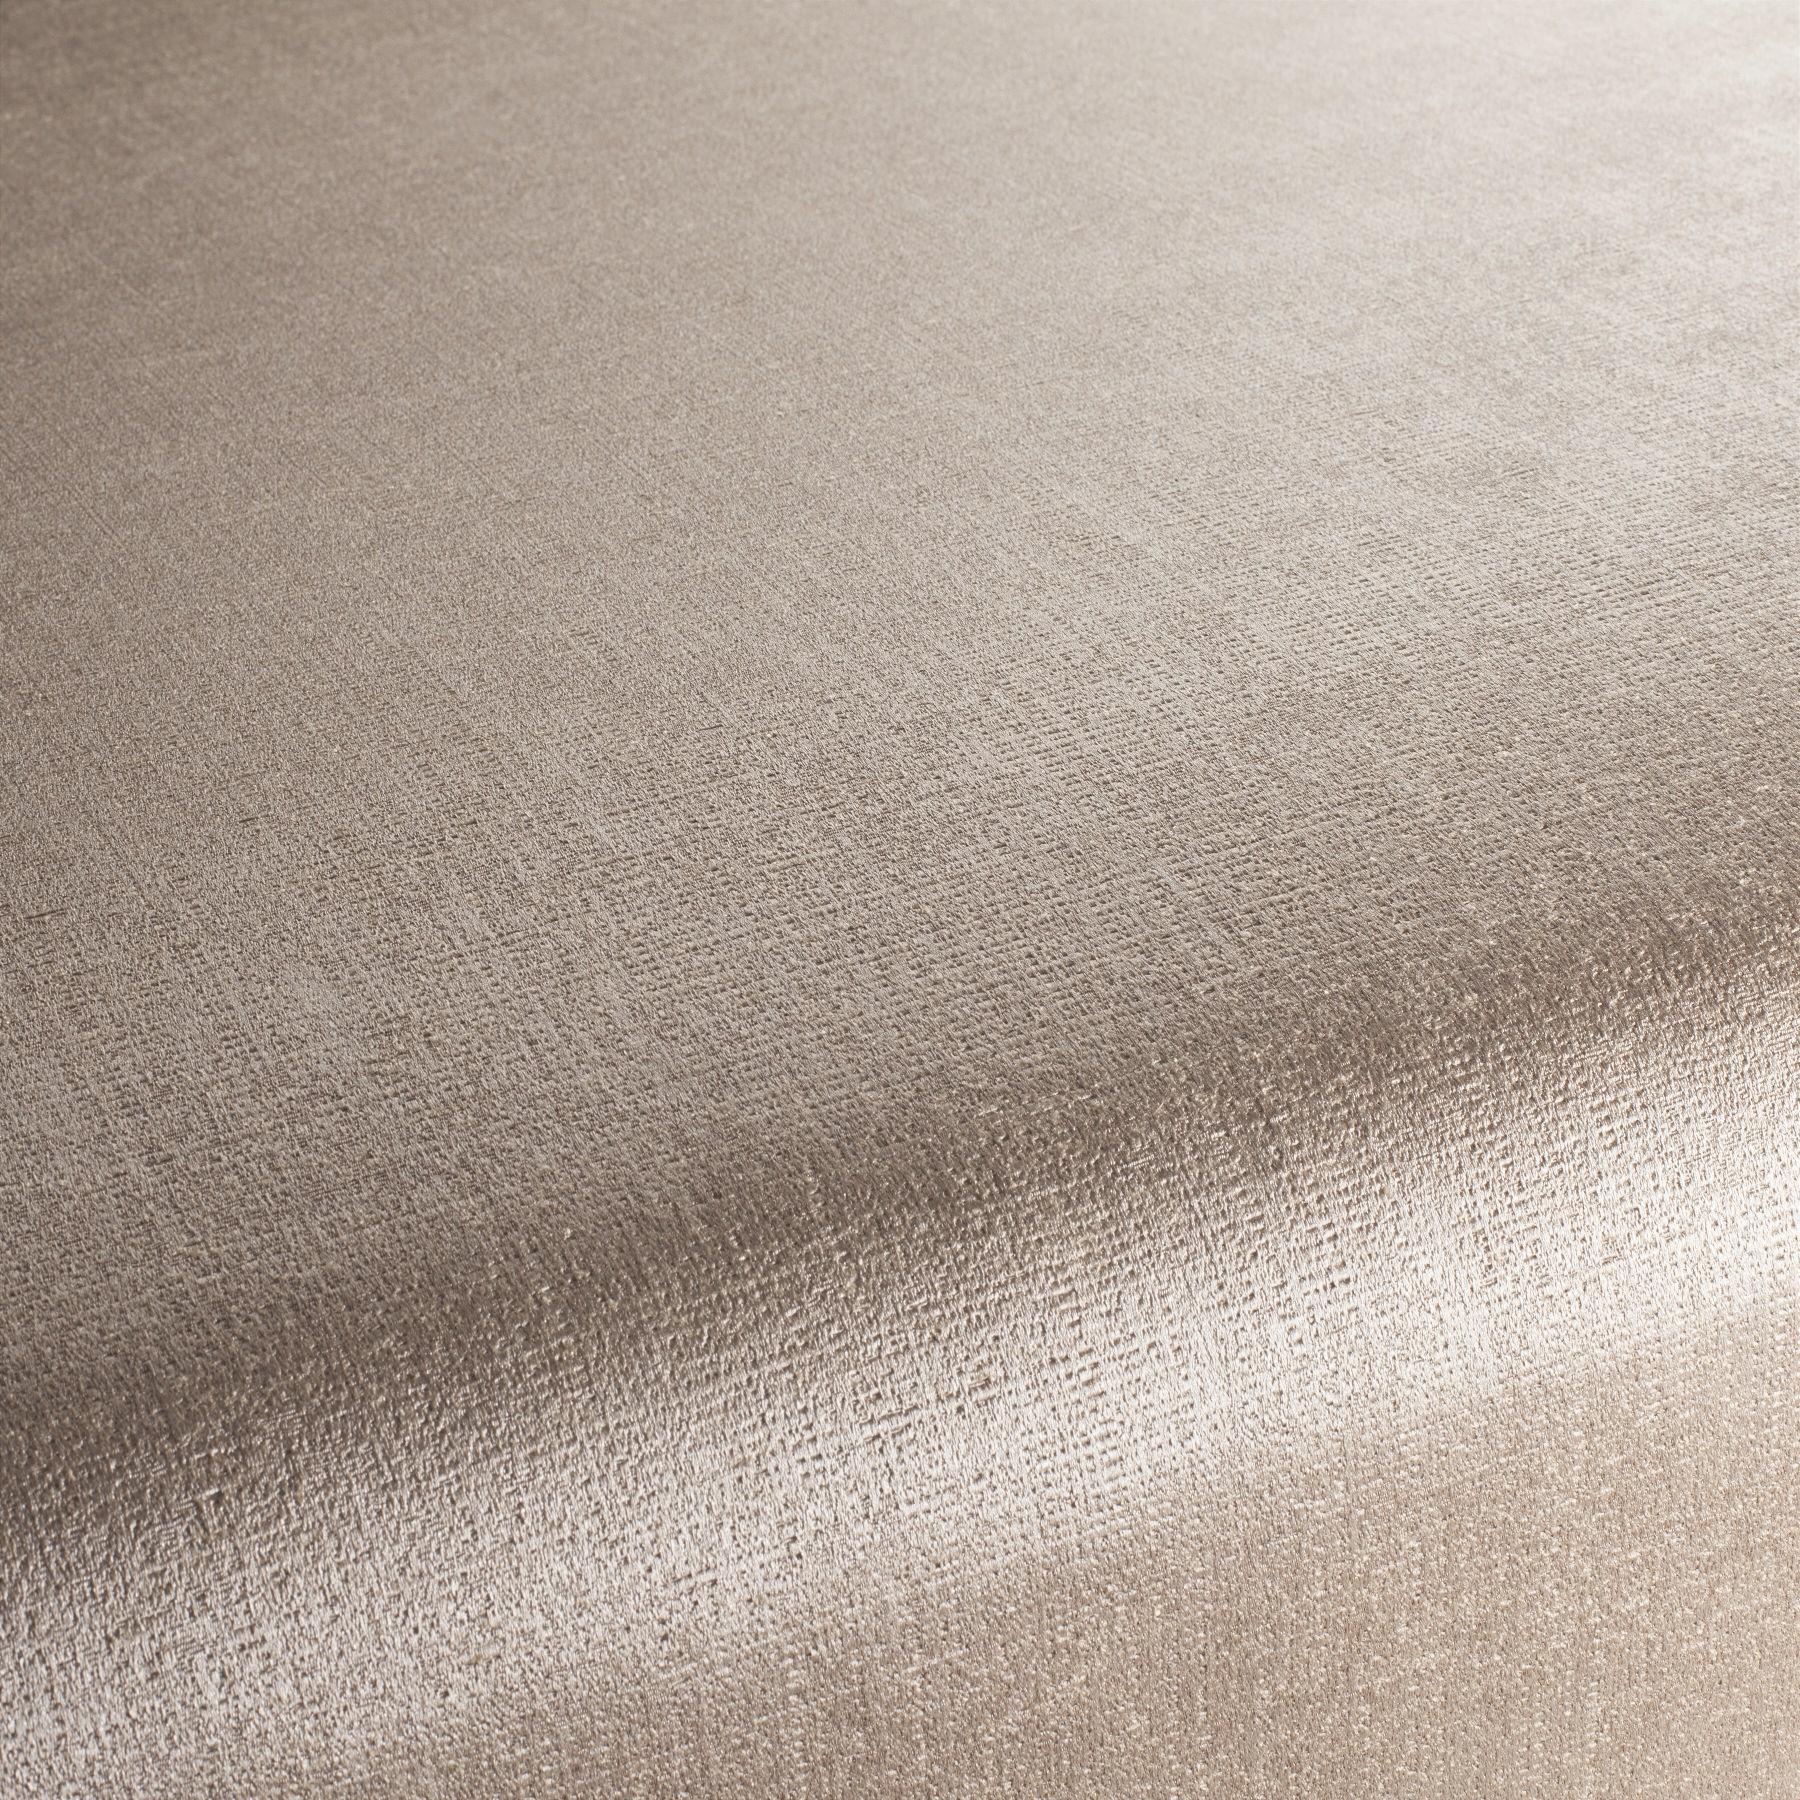 Upholstery Fabric Eaton Square 1 1350 070 Jab Anstoetz Fabrics